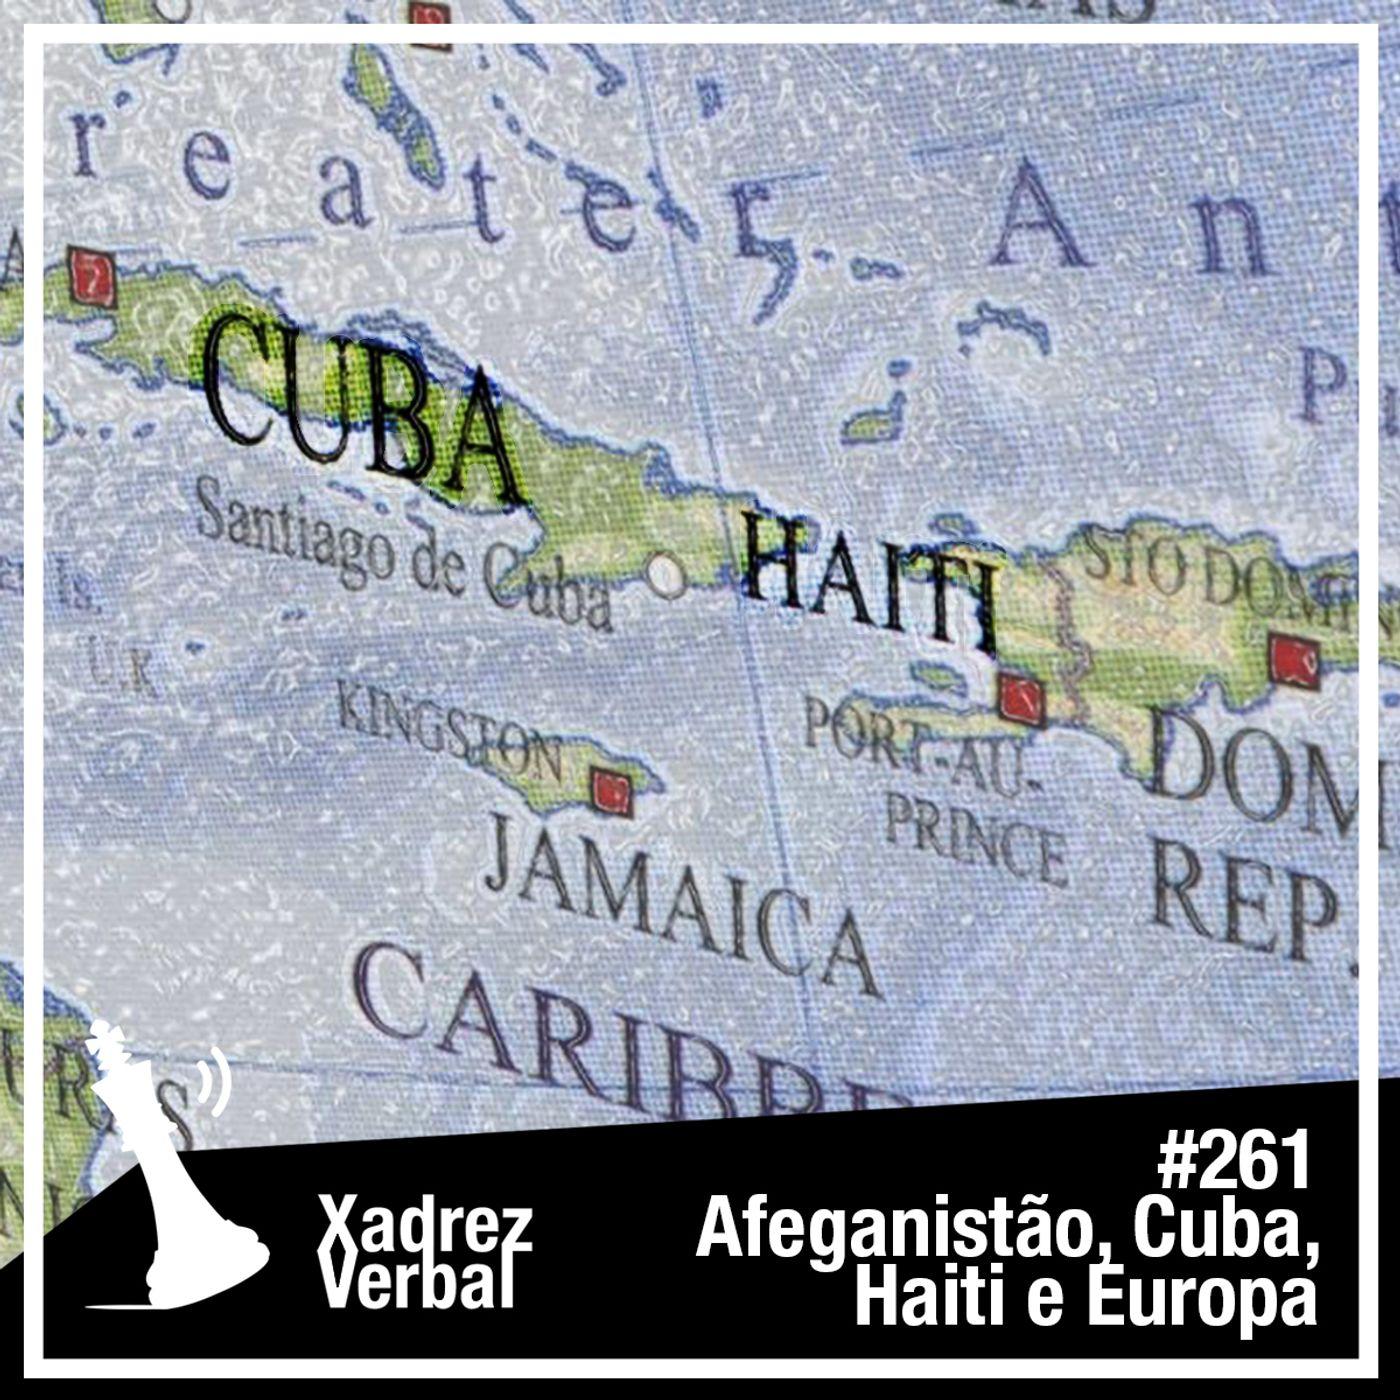 Xadrez Verbal #261 Tormenta Política no Caribe